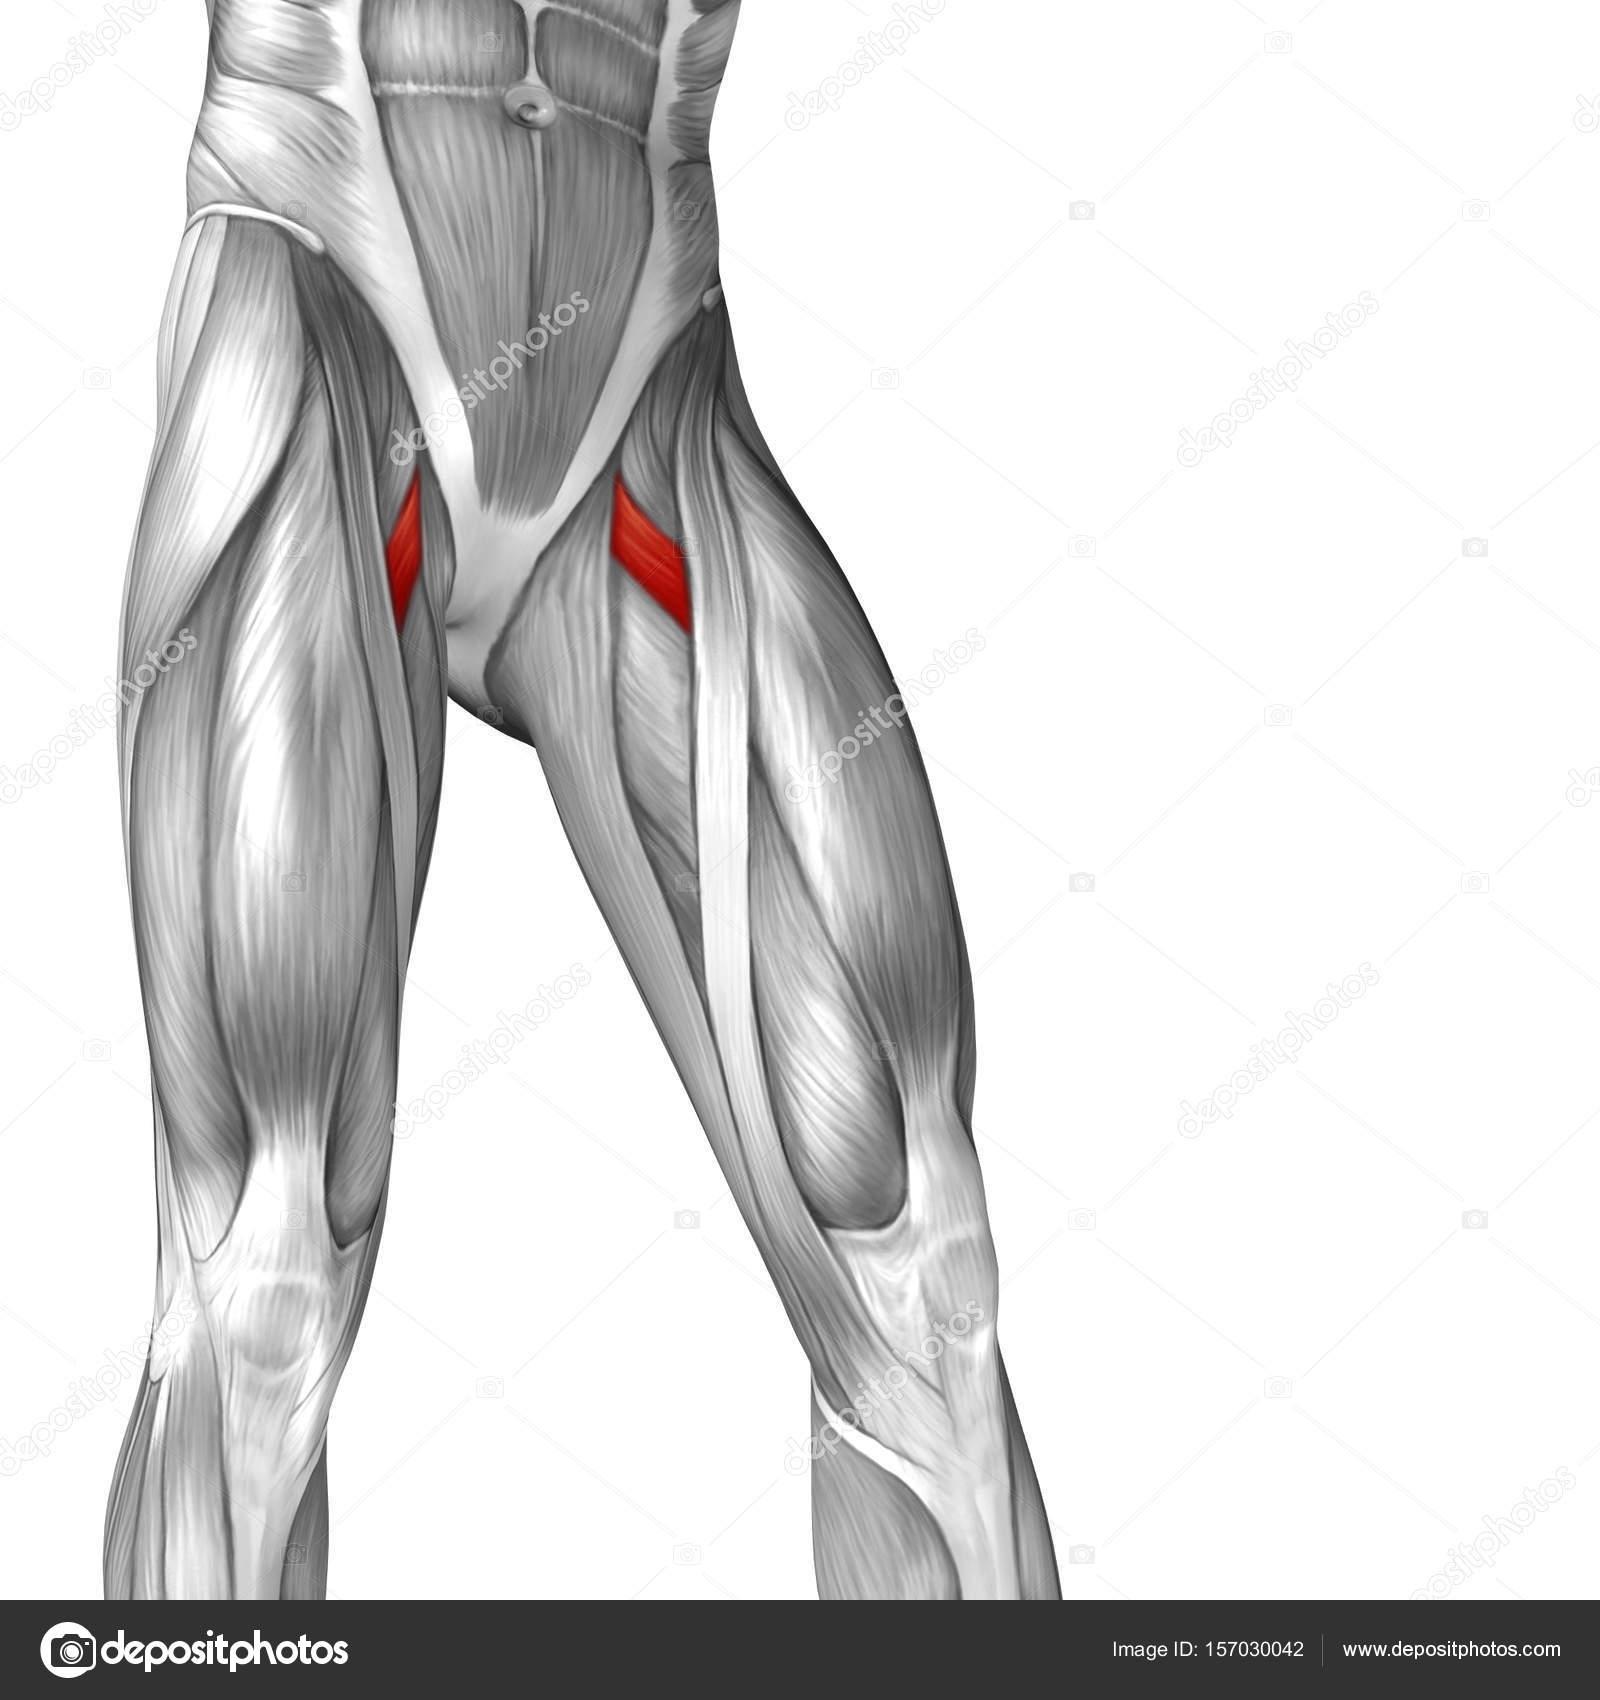 Human Upper Legs Anatomy Stock Photo Design36 157030042